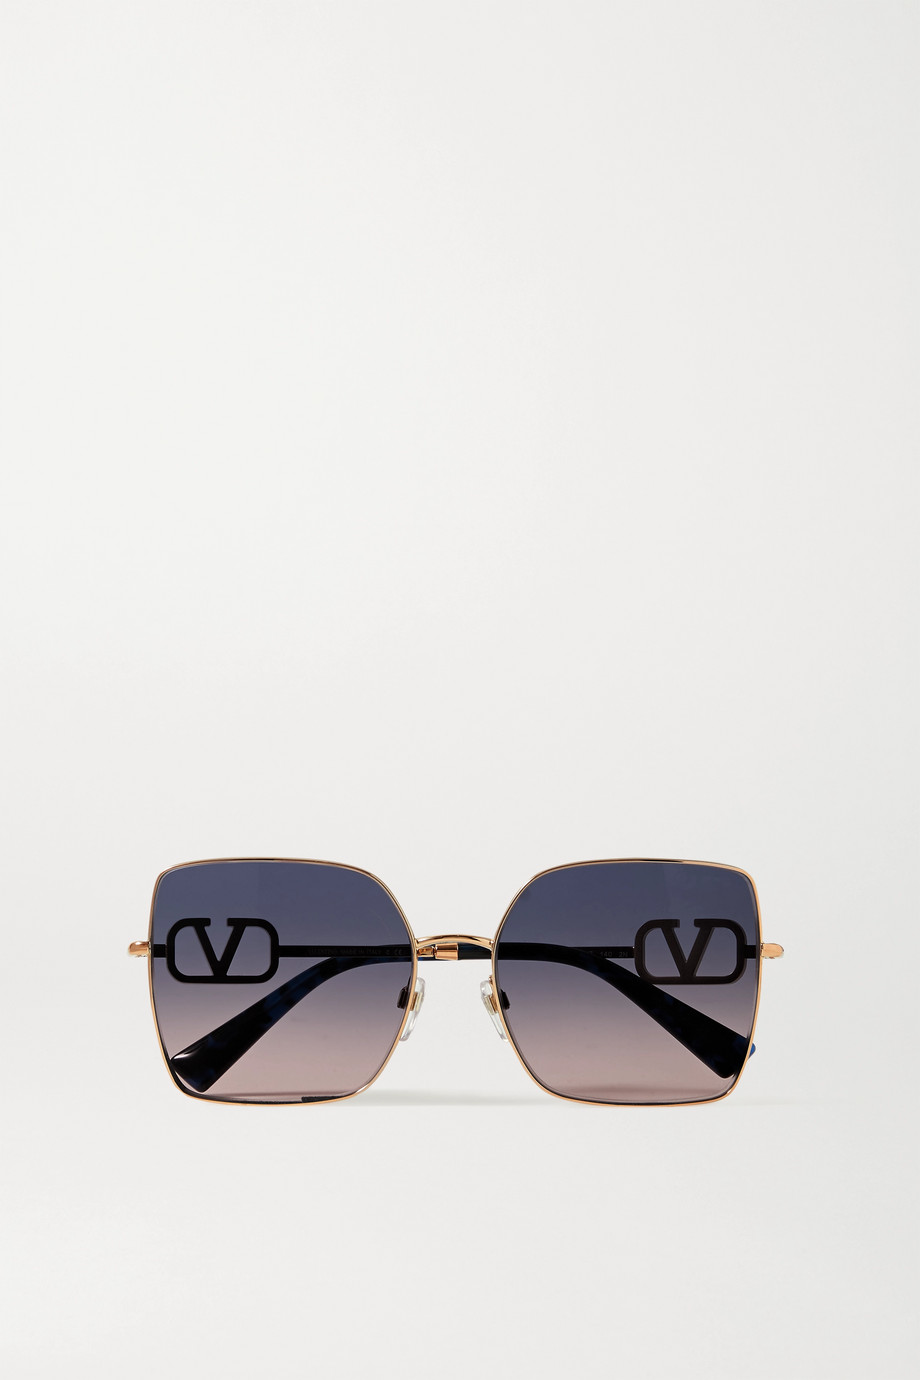 Valentino Valentino Garavani Allure VLOGO square-frame crystal-embellished rose gold-tone sunglasses